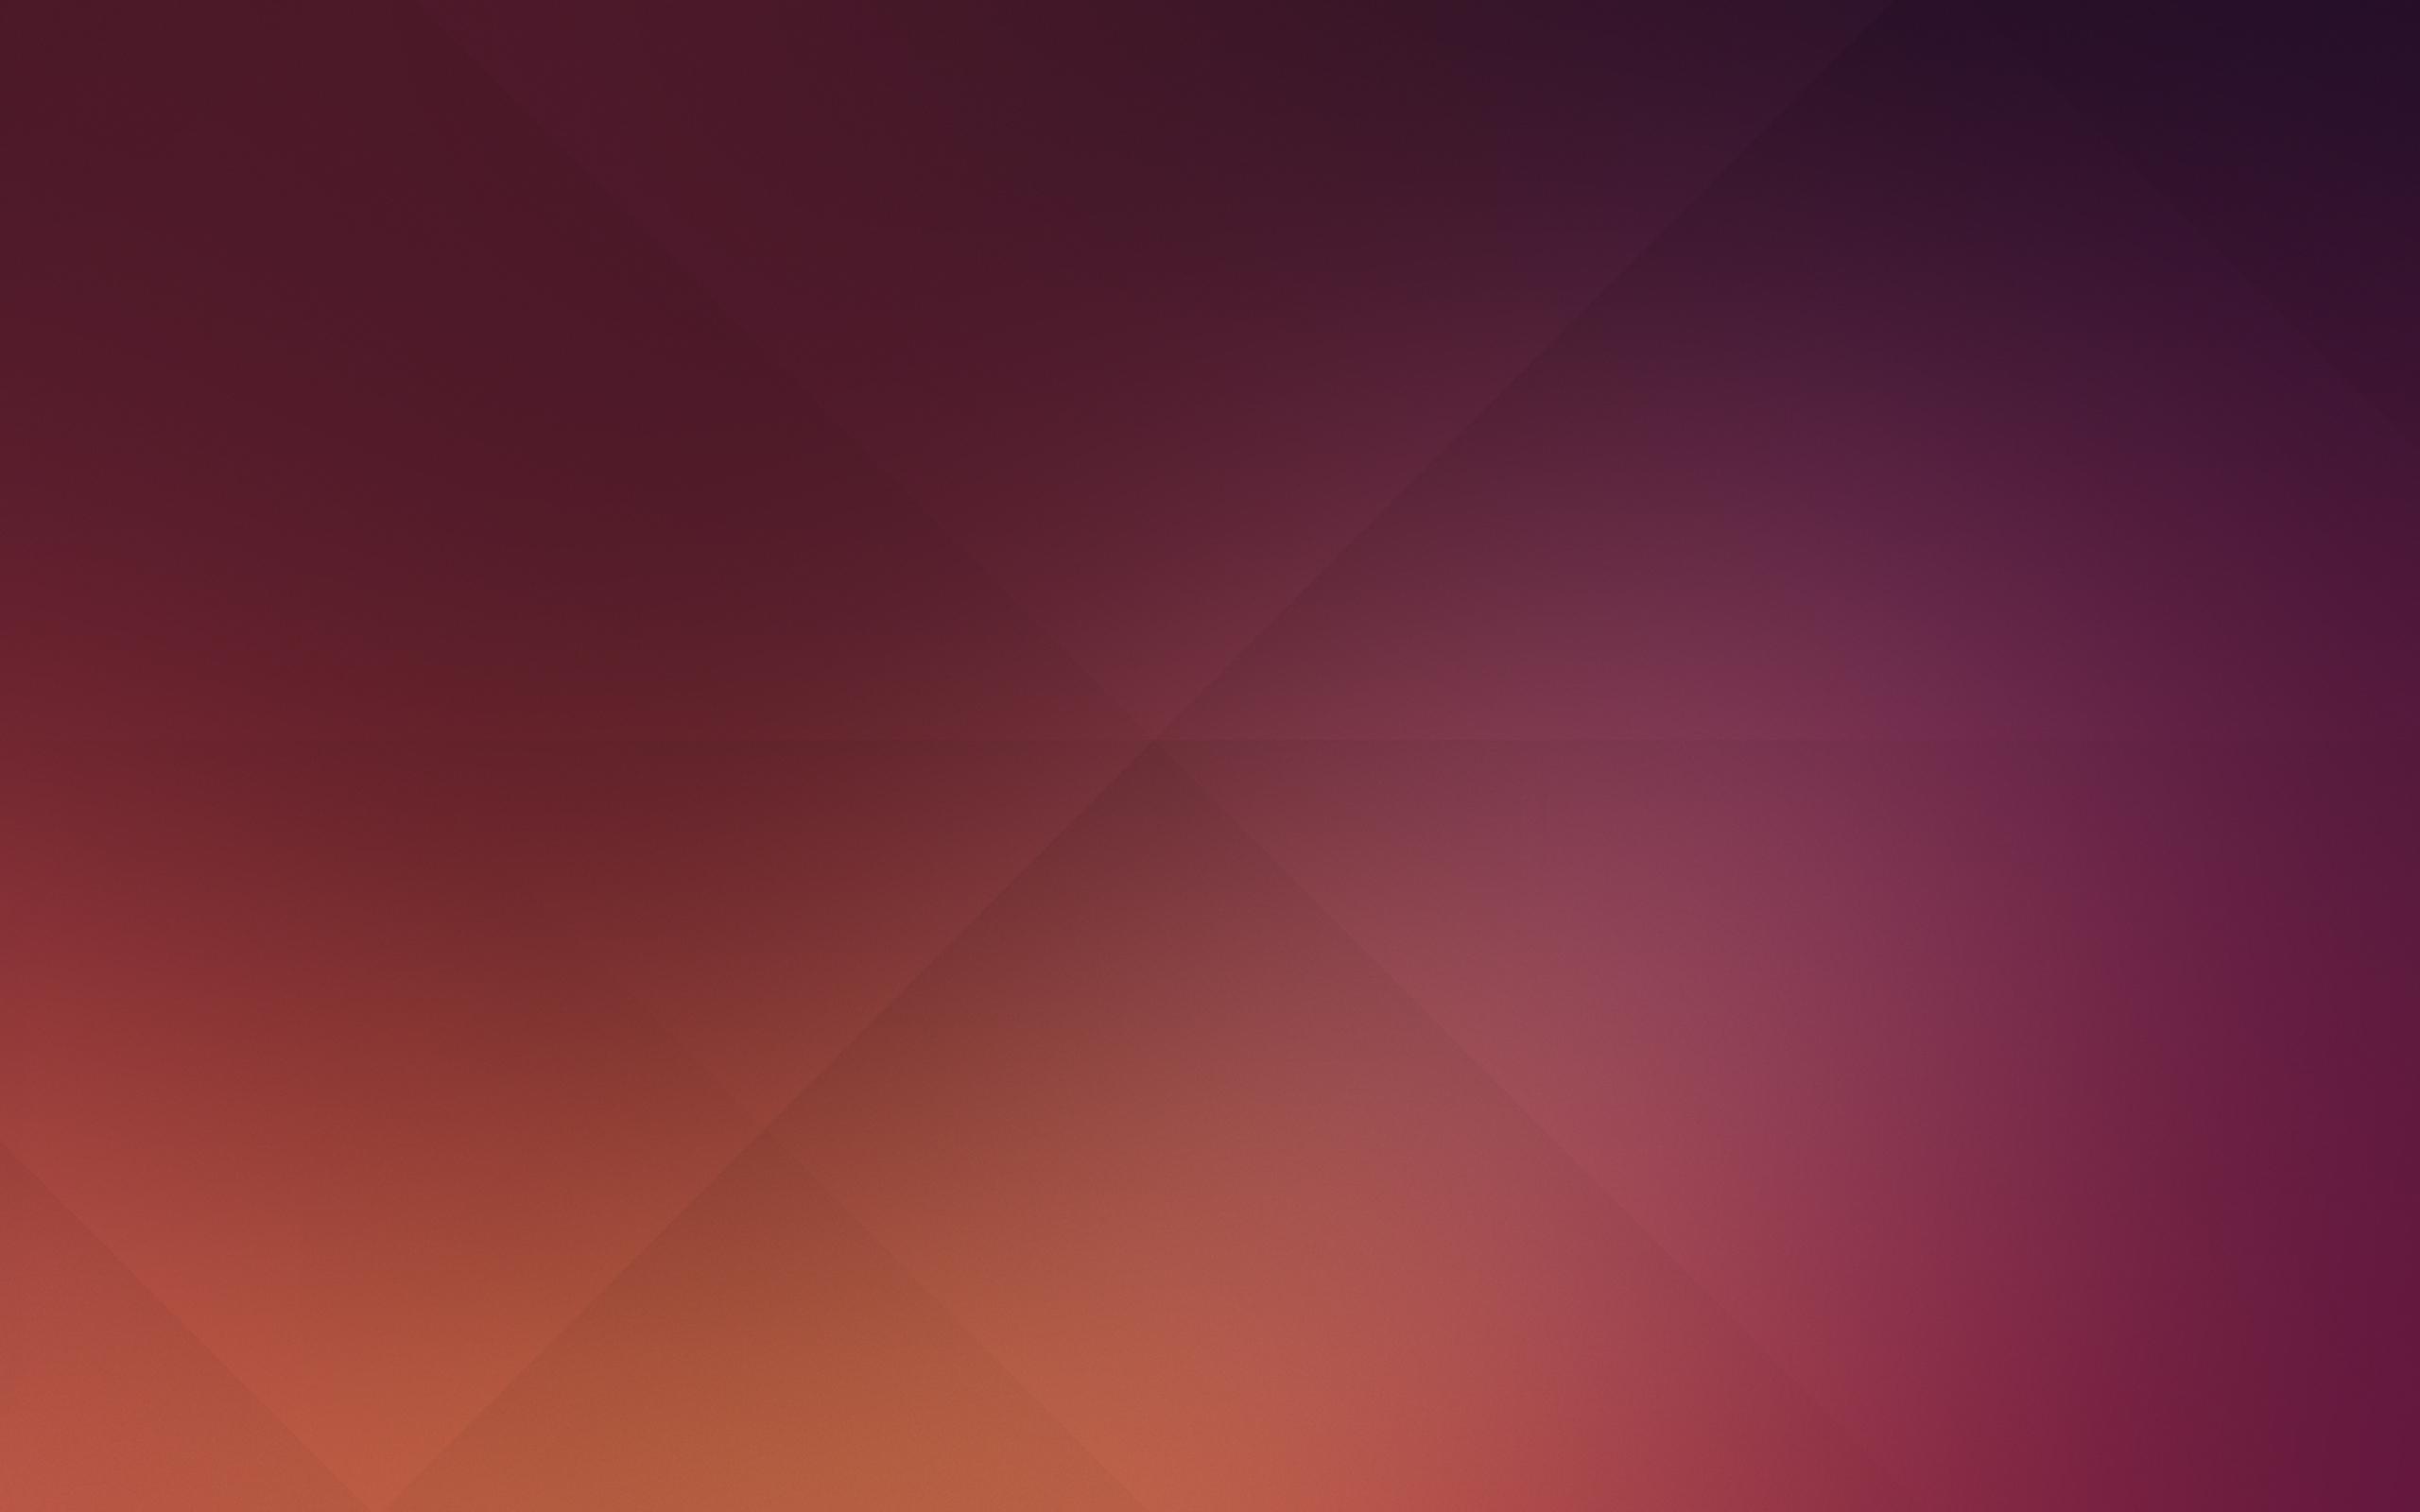 Ubuntu_14_04_approved_default_wallpaper